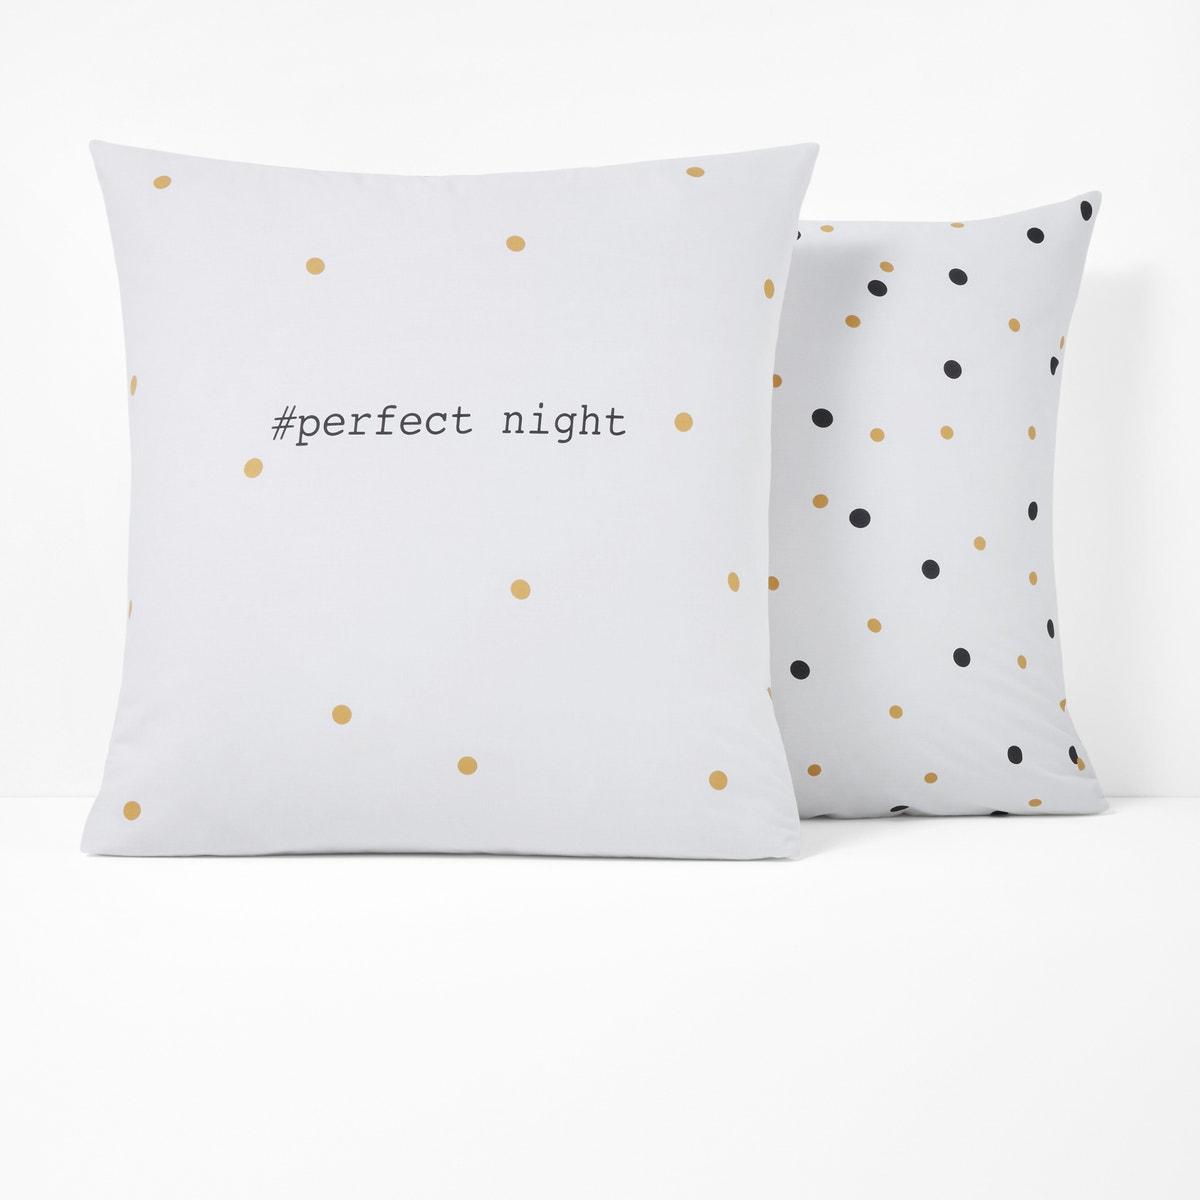 Perfect Night コットン プリント枕カバー